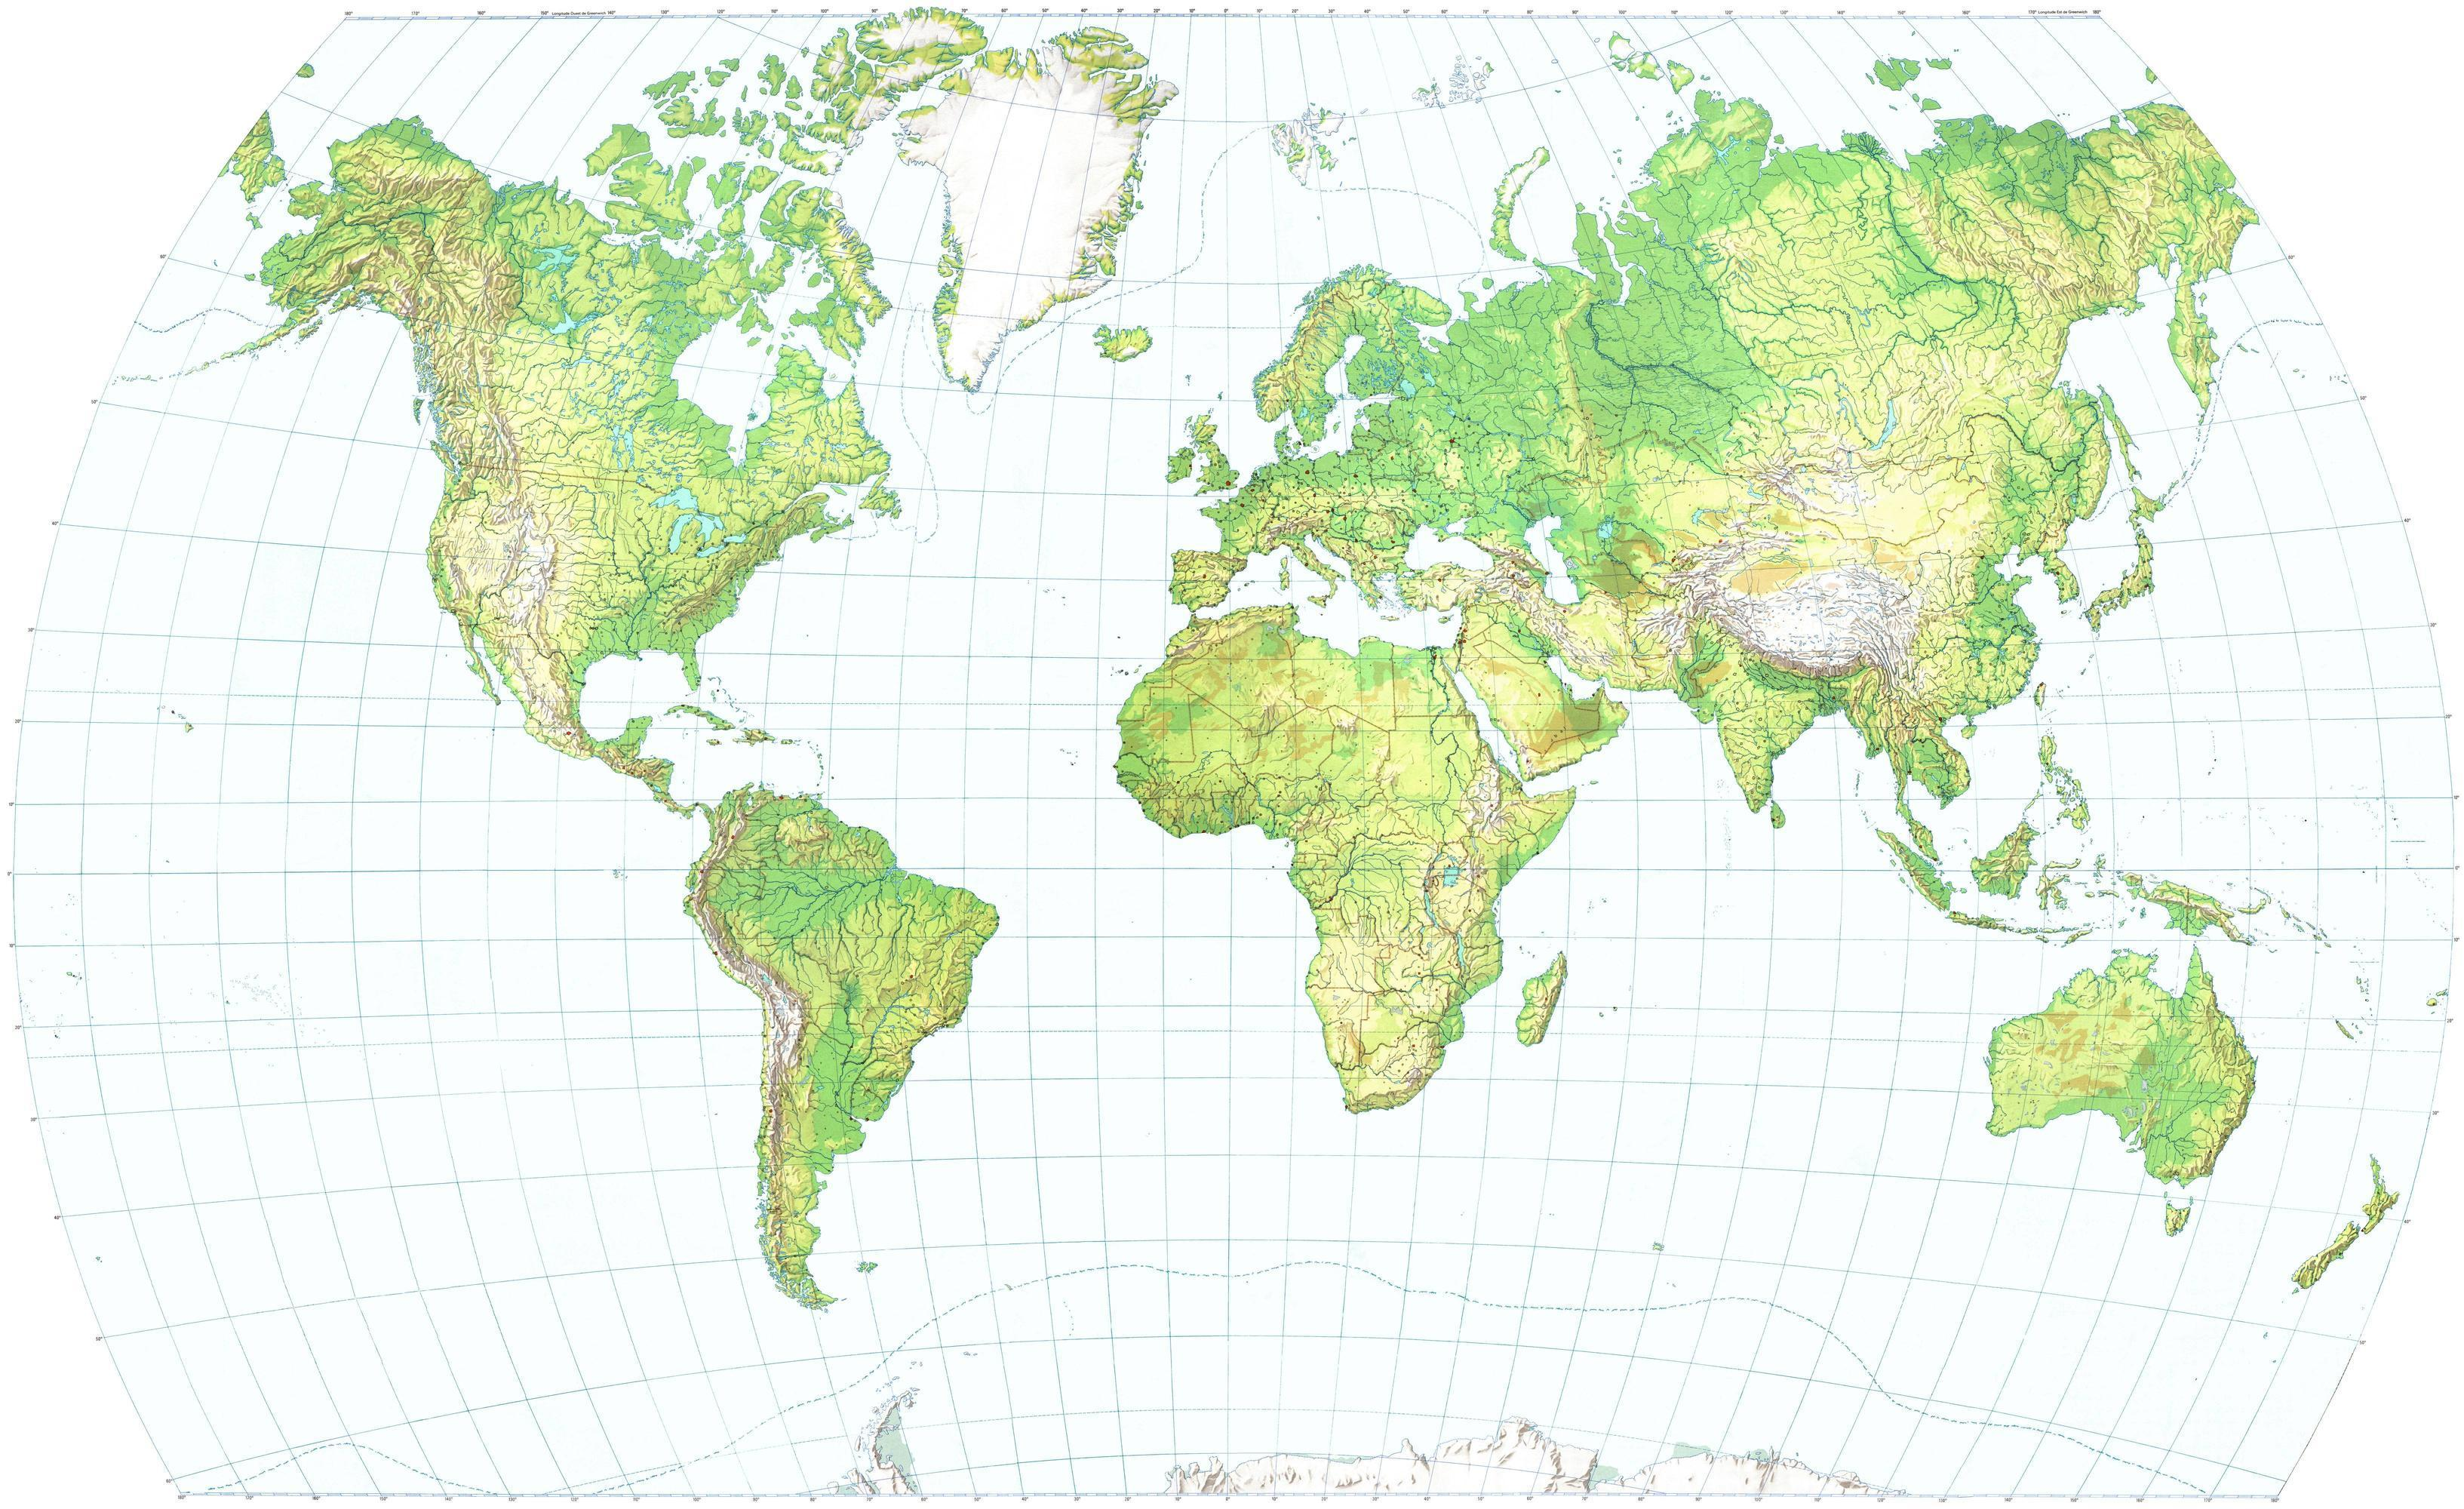 World Map Wallpapers High Resolution - Wallpaper Cave